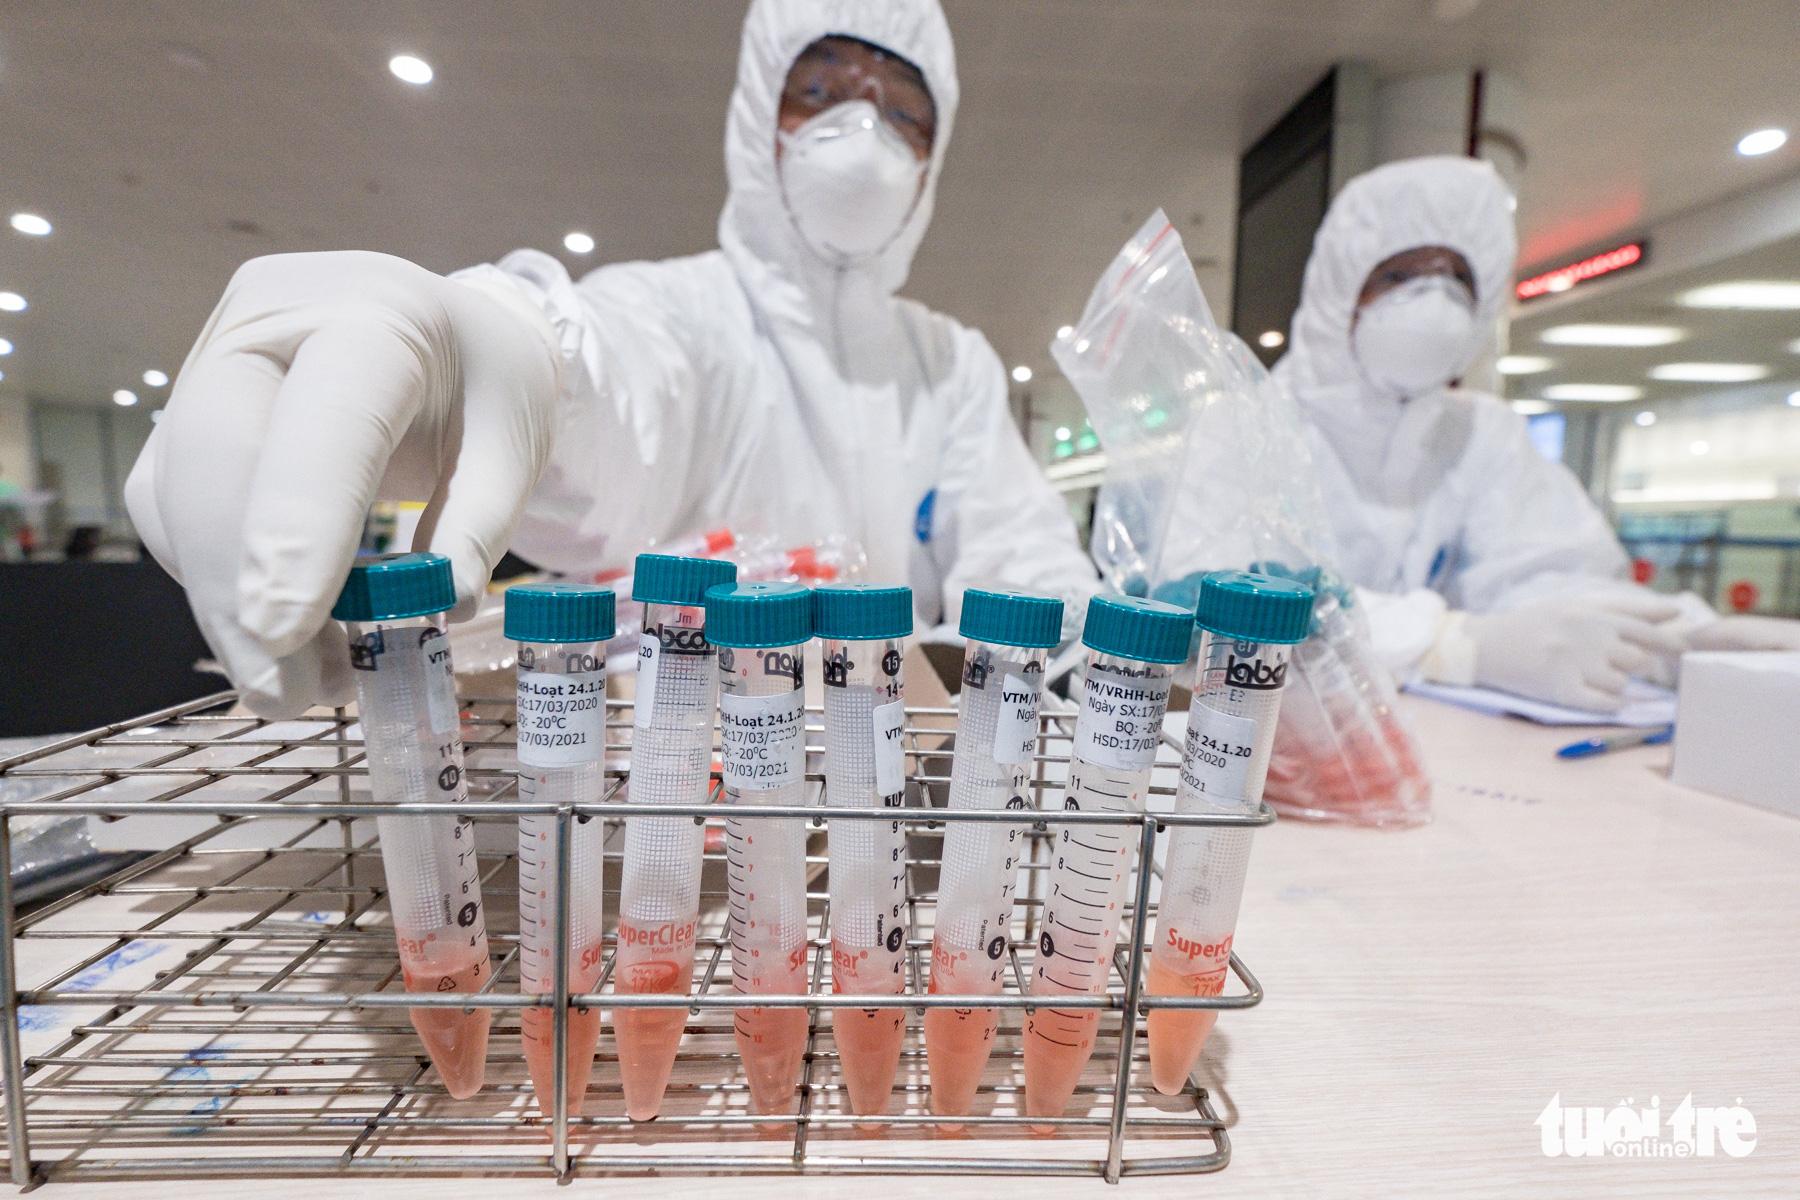 A medical worker prepares sample tubes for sampling arrivals at Noi Bai International Airport in Hanoi, Vietnam, March 18, 2020. Photo: Nam Tran / Tuoi Tre